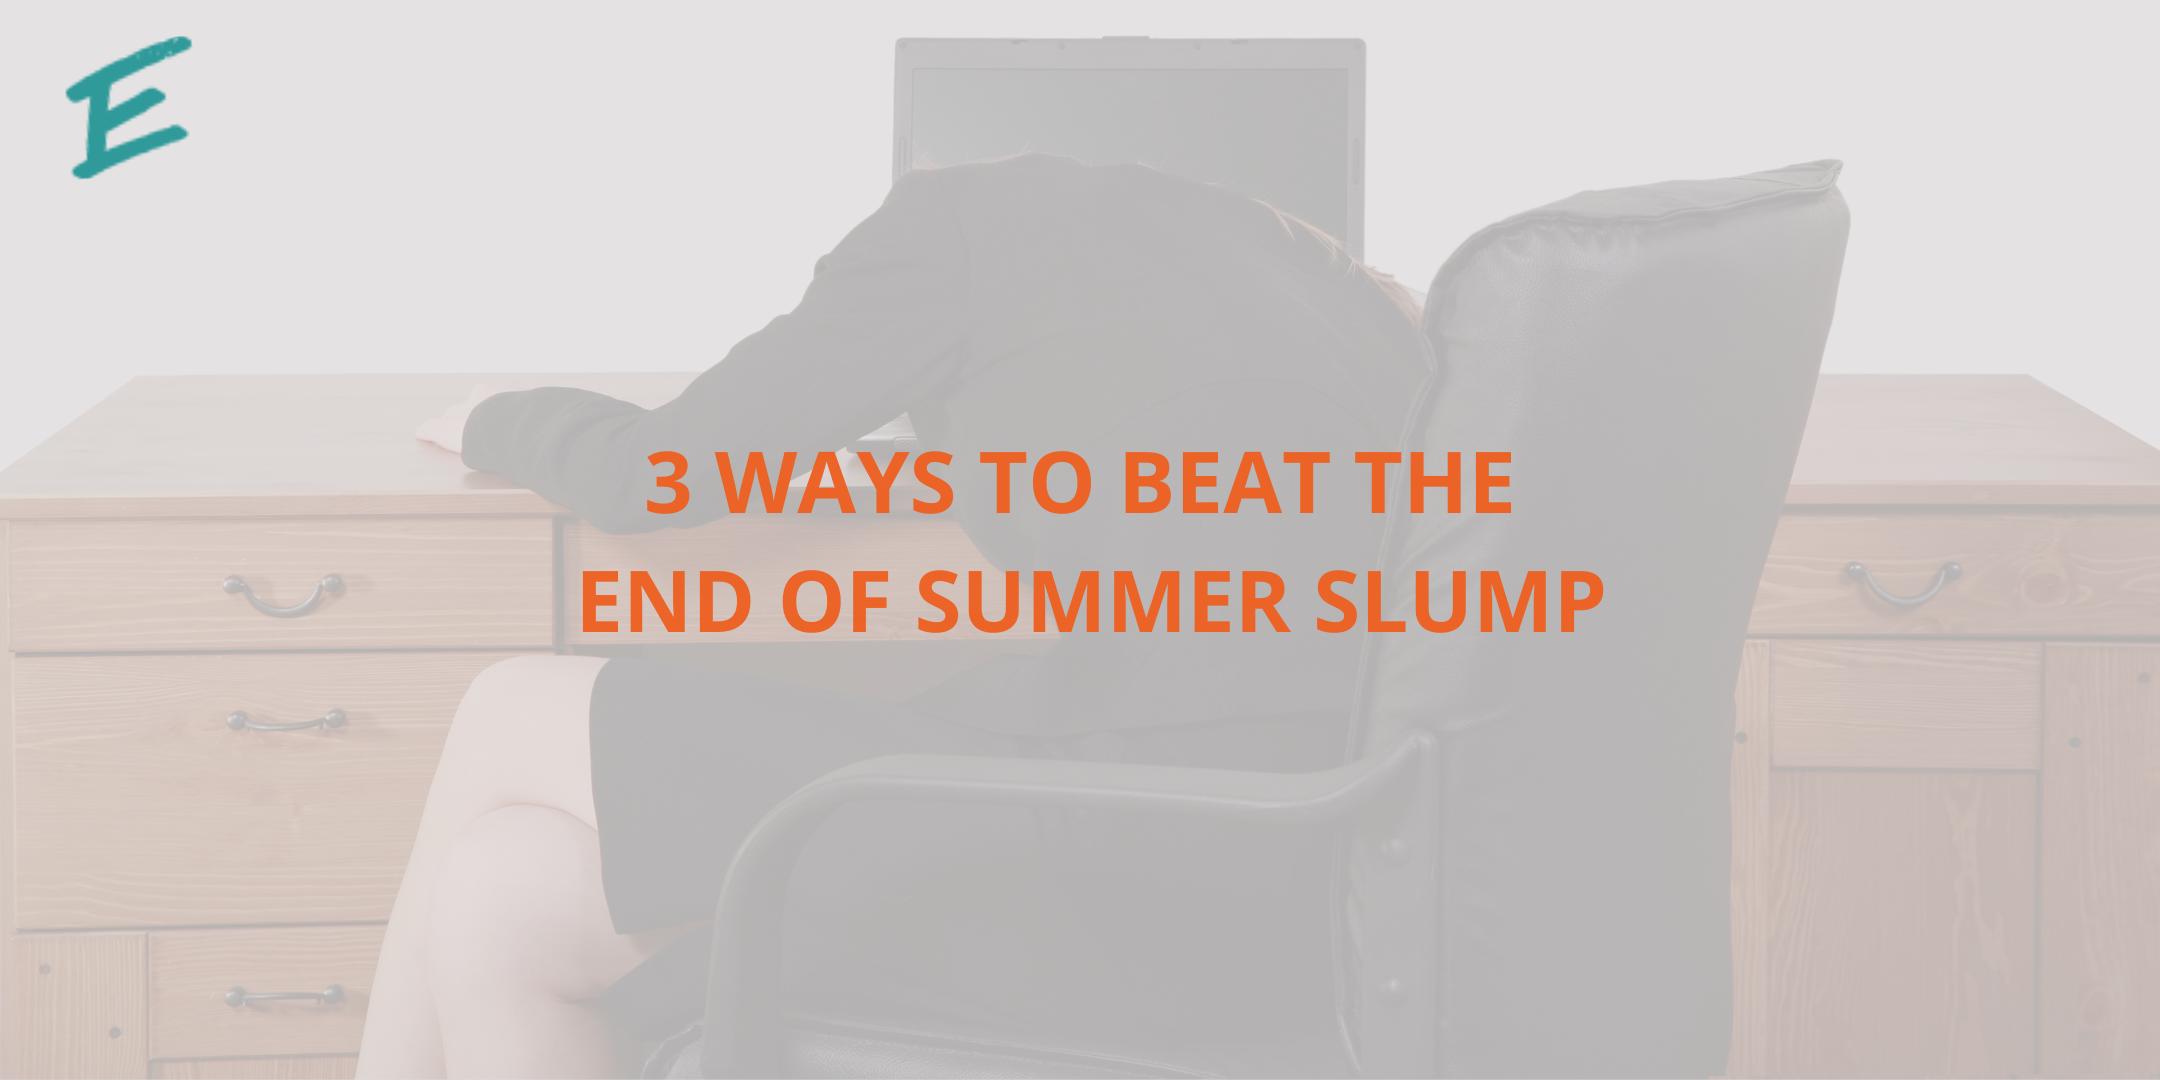 beat-end-of-summer-slump-3-ways